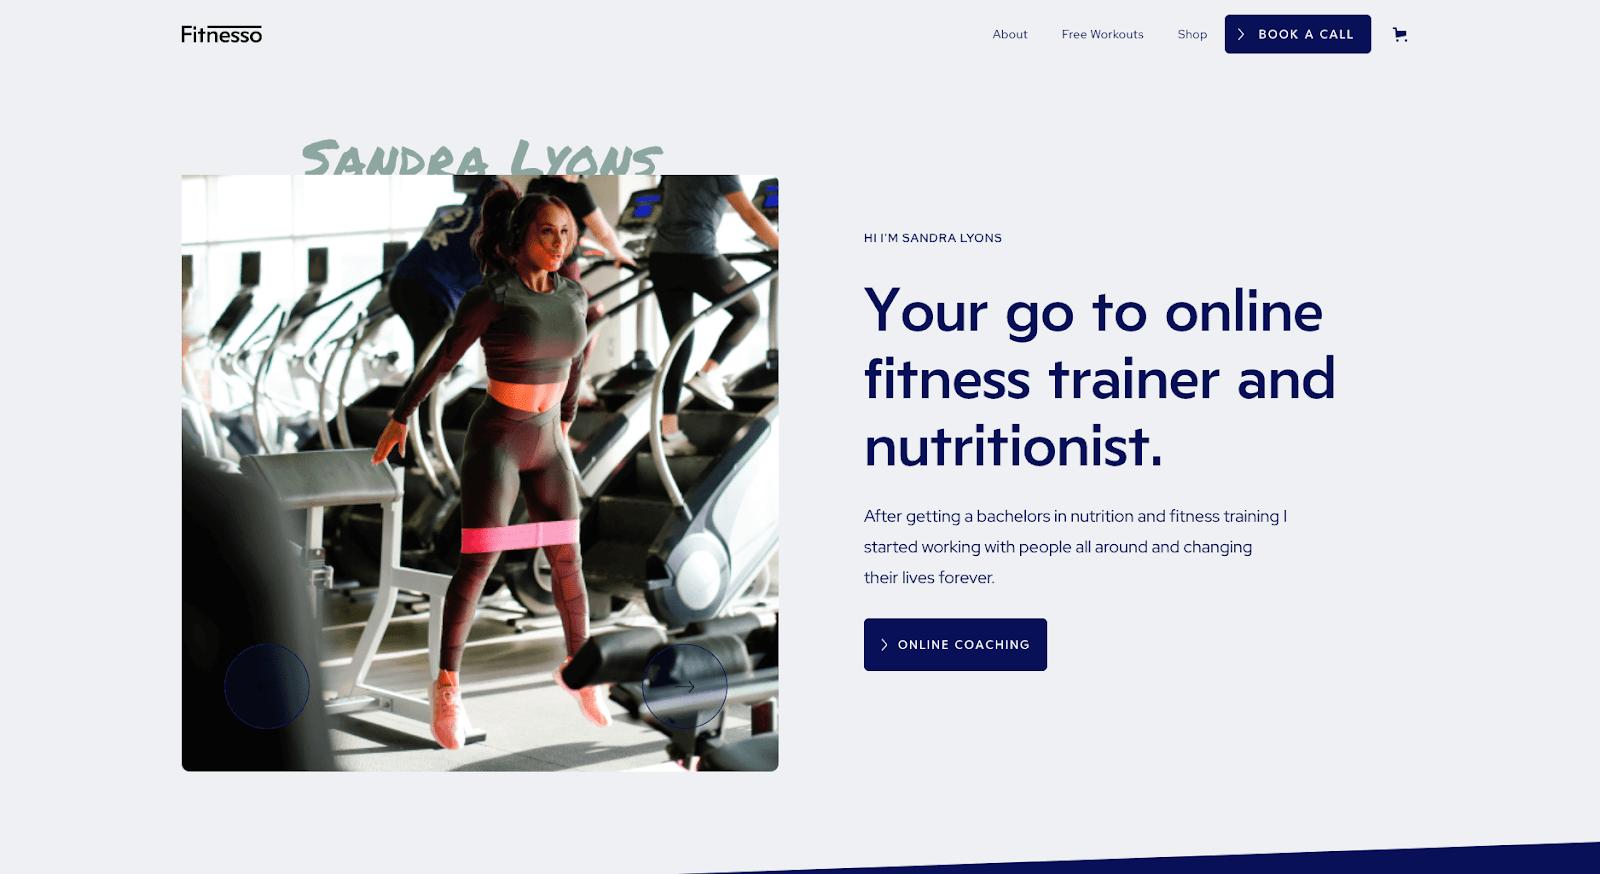 Fitnesso Webflow template